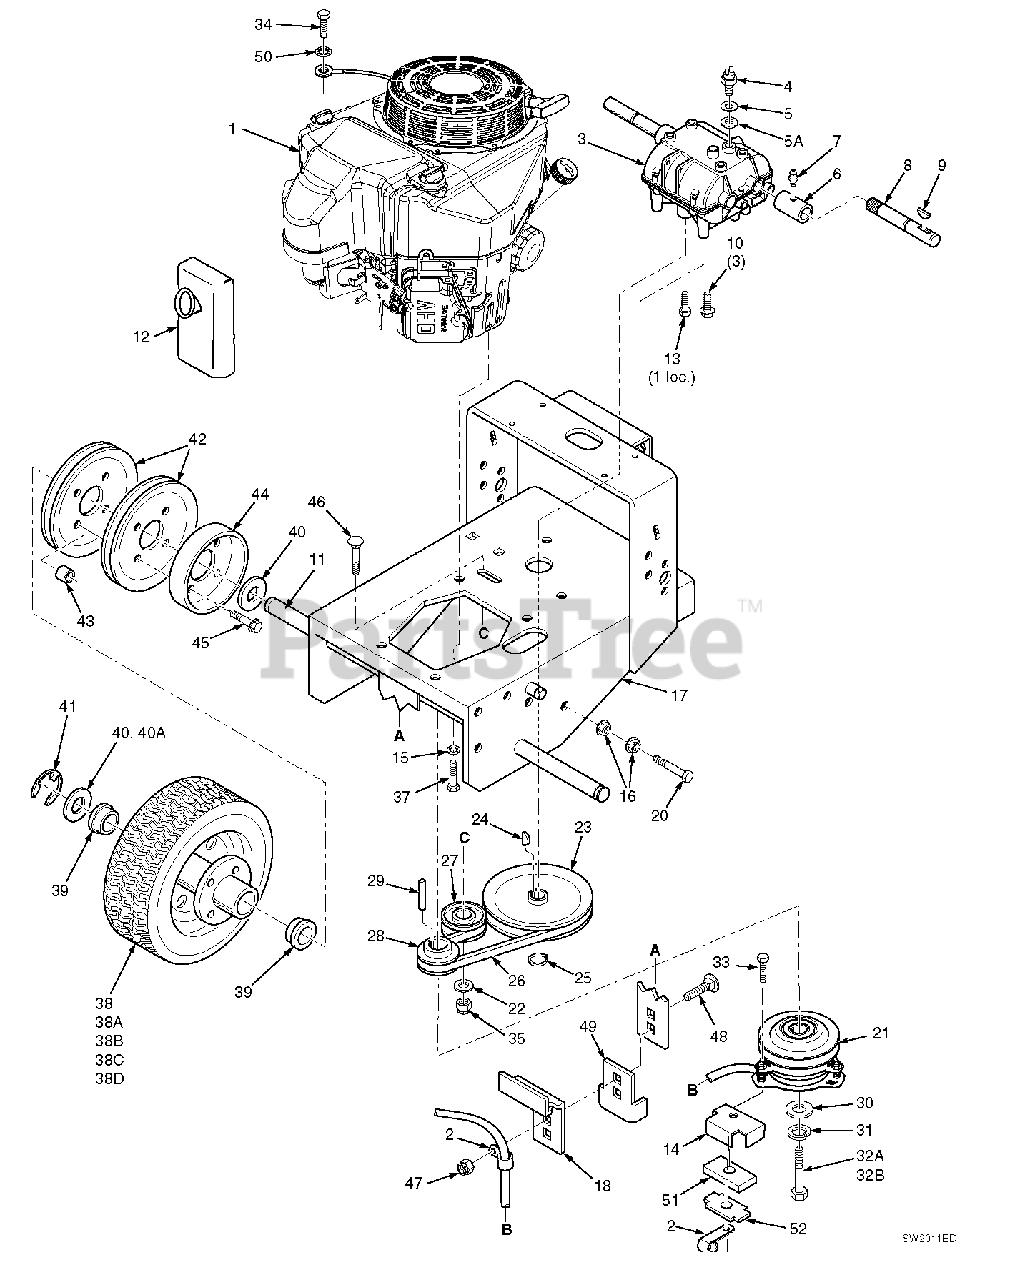 Scag Sw32 16fs